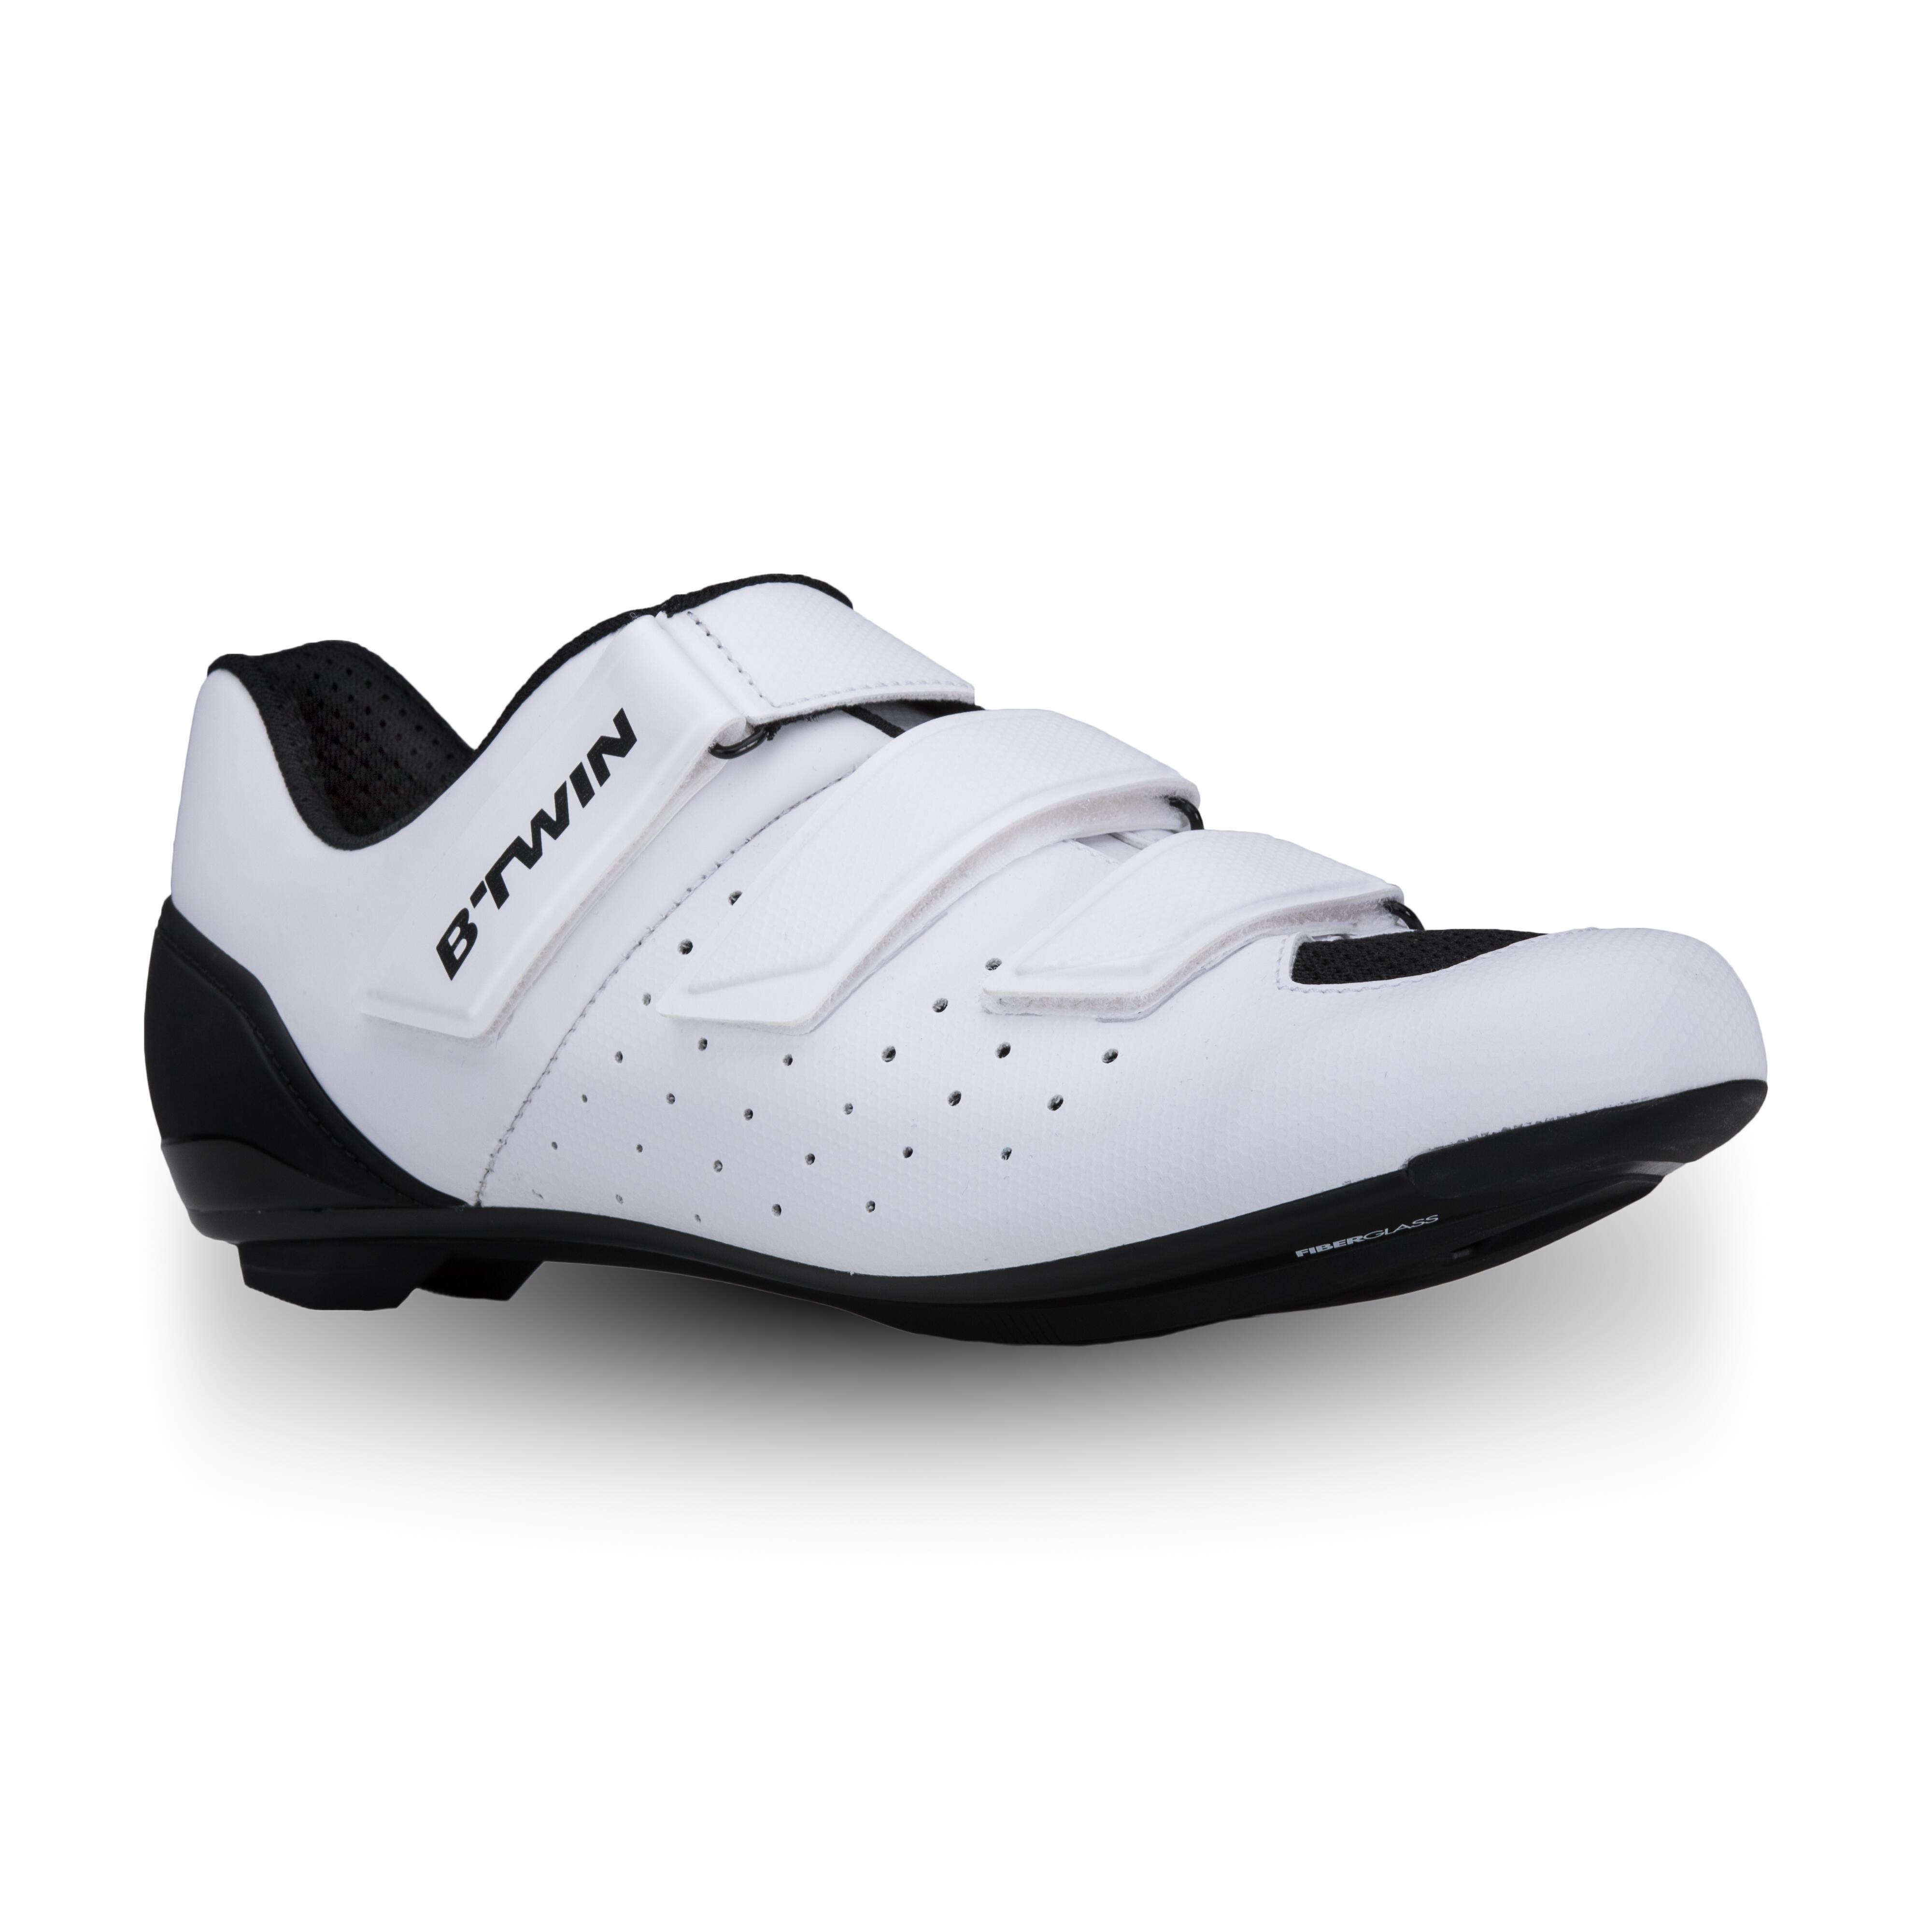 Chaussures vélo route Cyclosport 500 BLANC - Van rysel